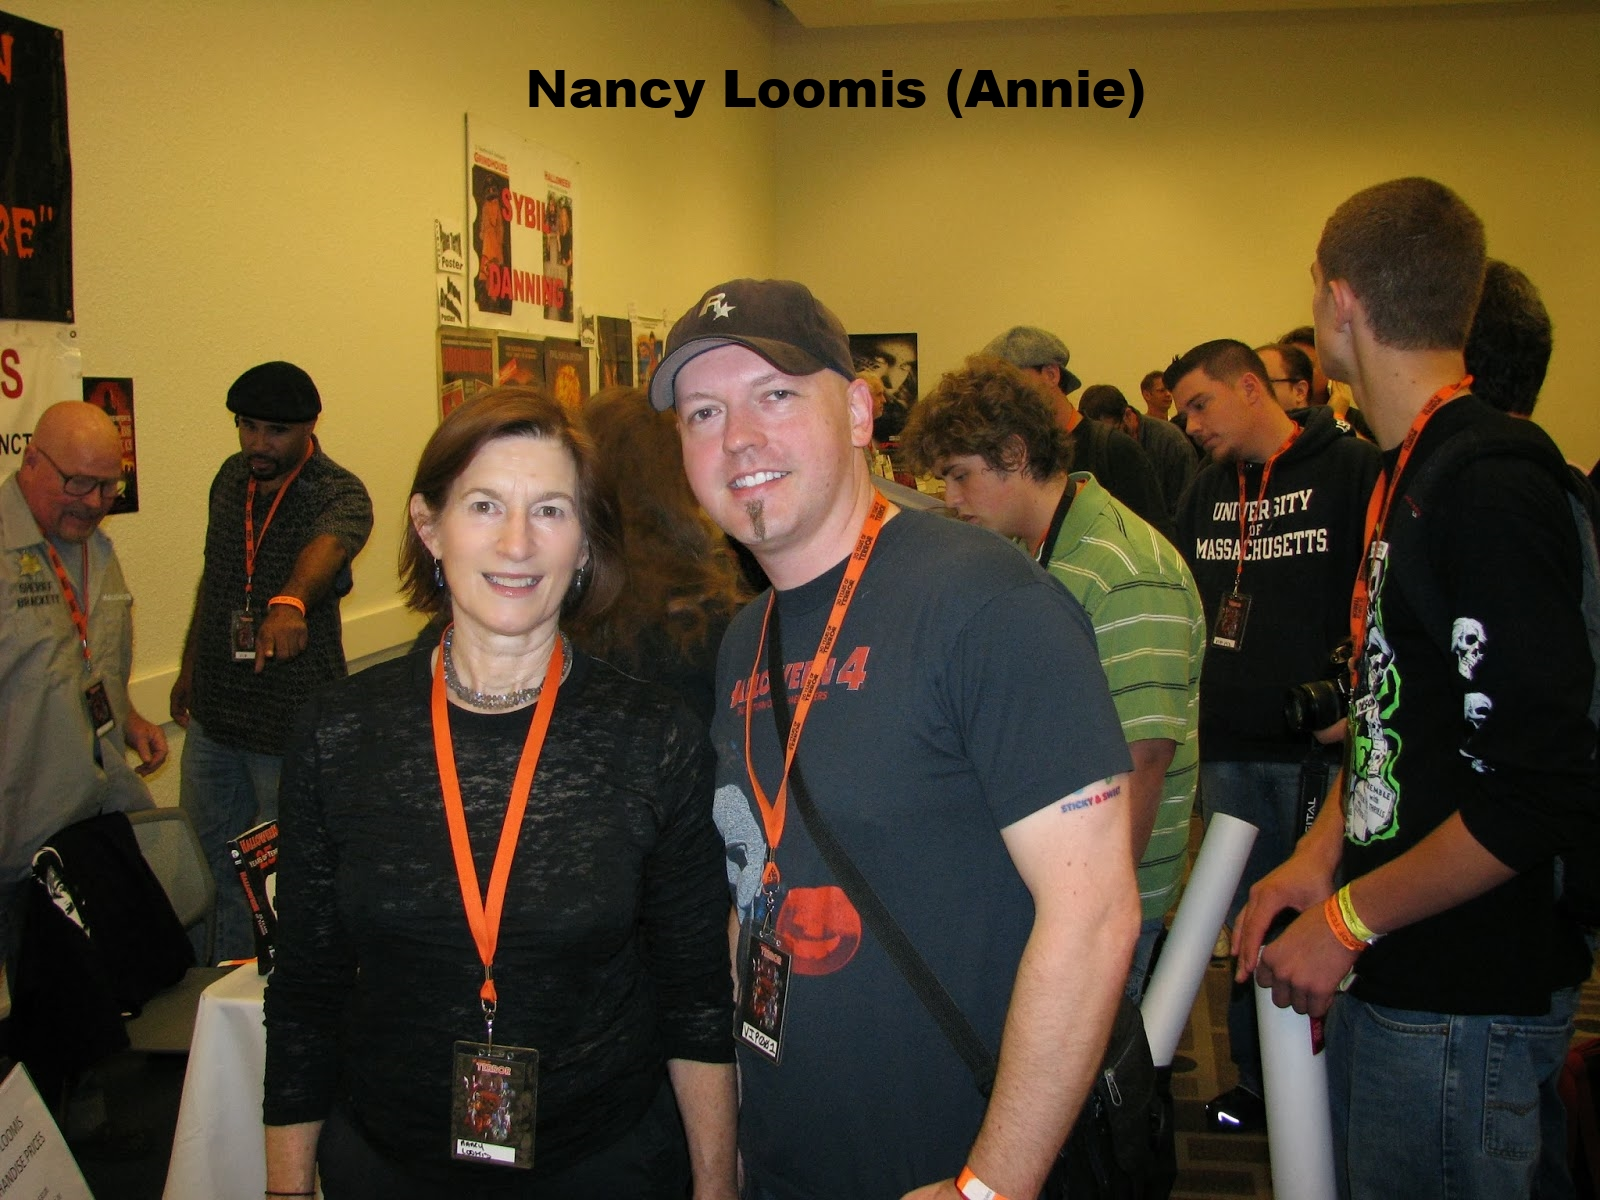 NancyLoomis.JPG